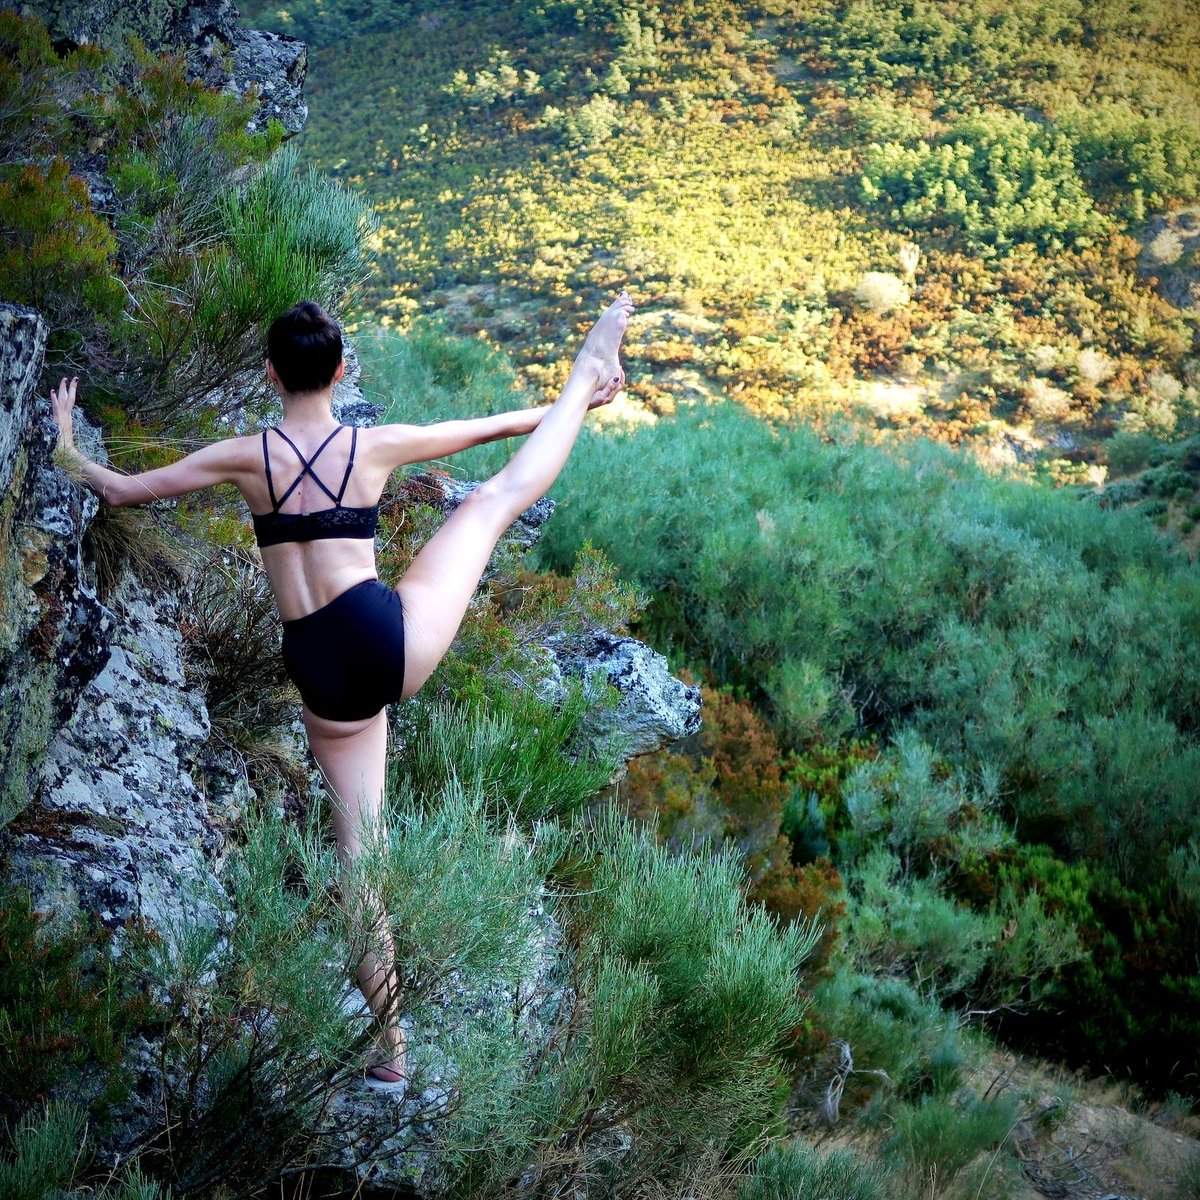 Dancing in unlikely places, part 1,394,932 #dance #ballet #gymnastics #dancer #ballerina #gymnast #adultballetgang pic.twitter.com/U9OviPpsNs